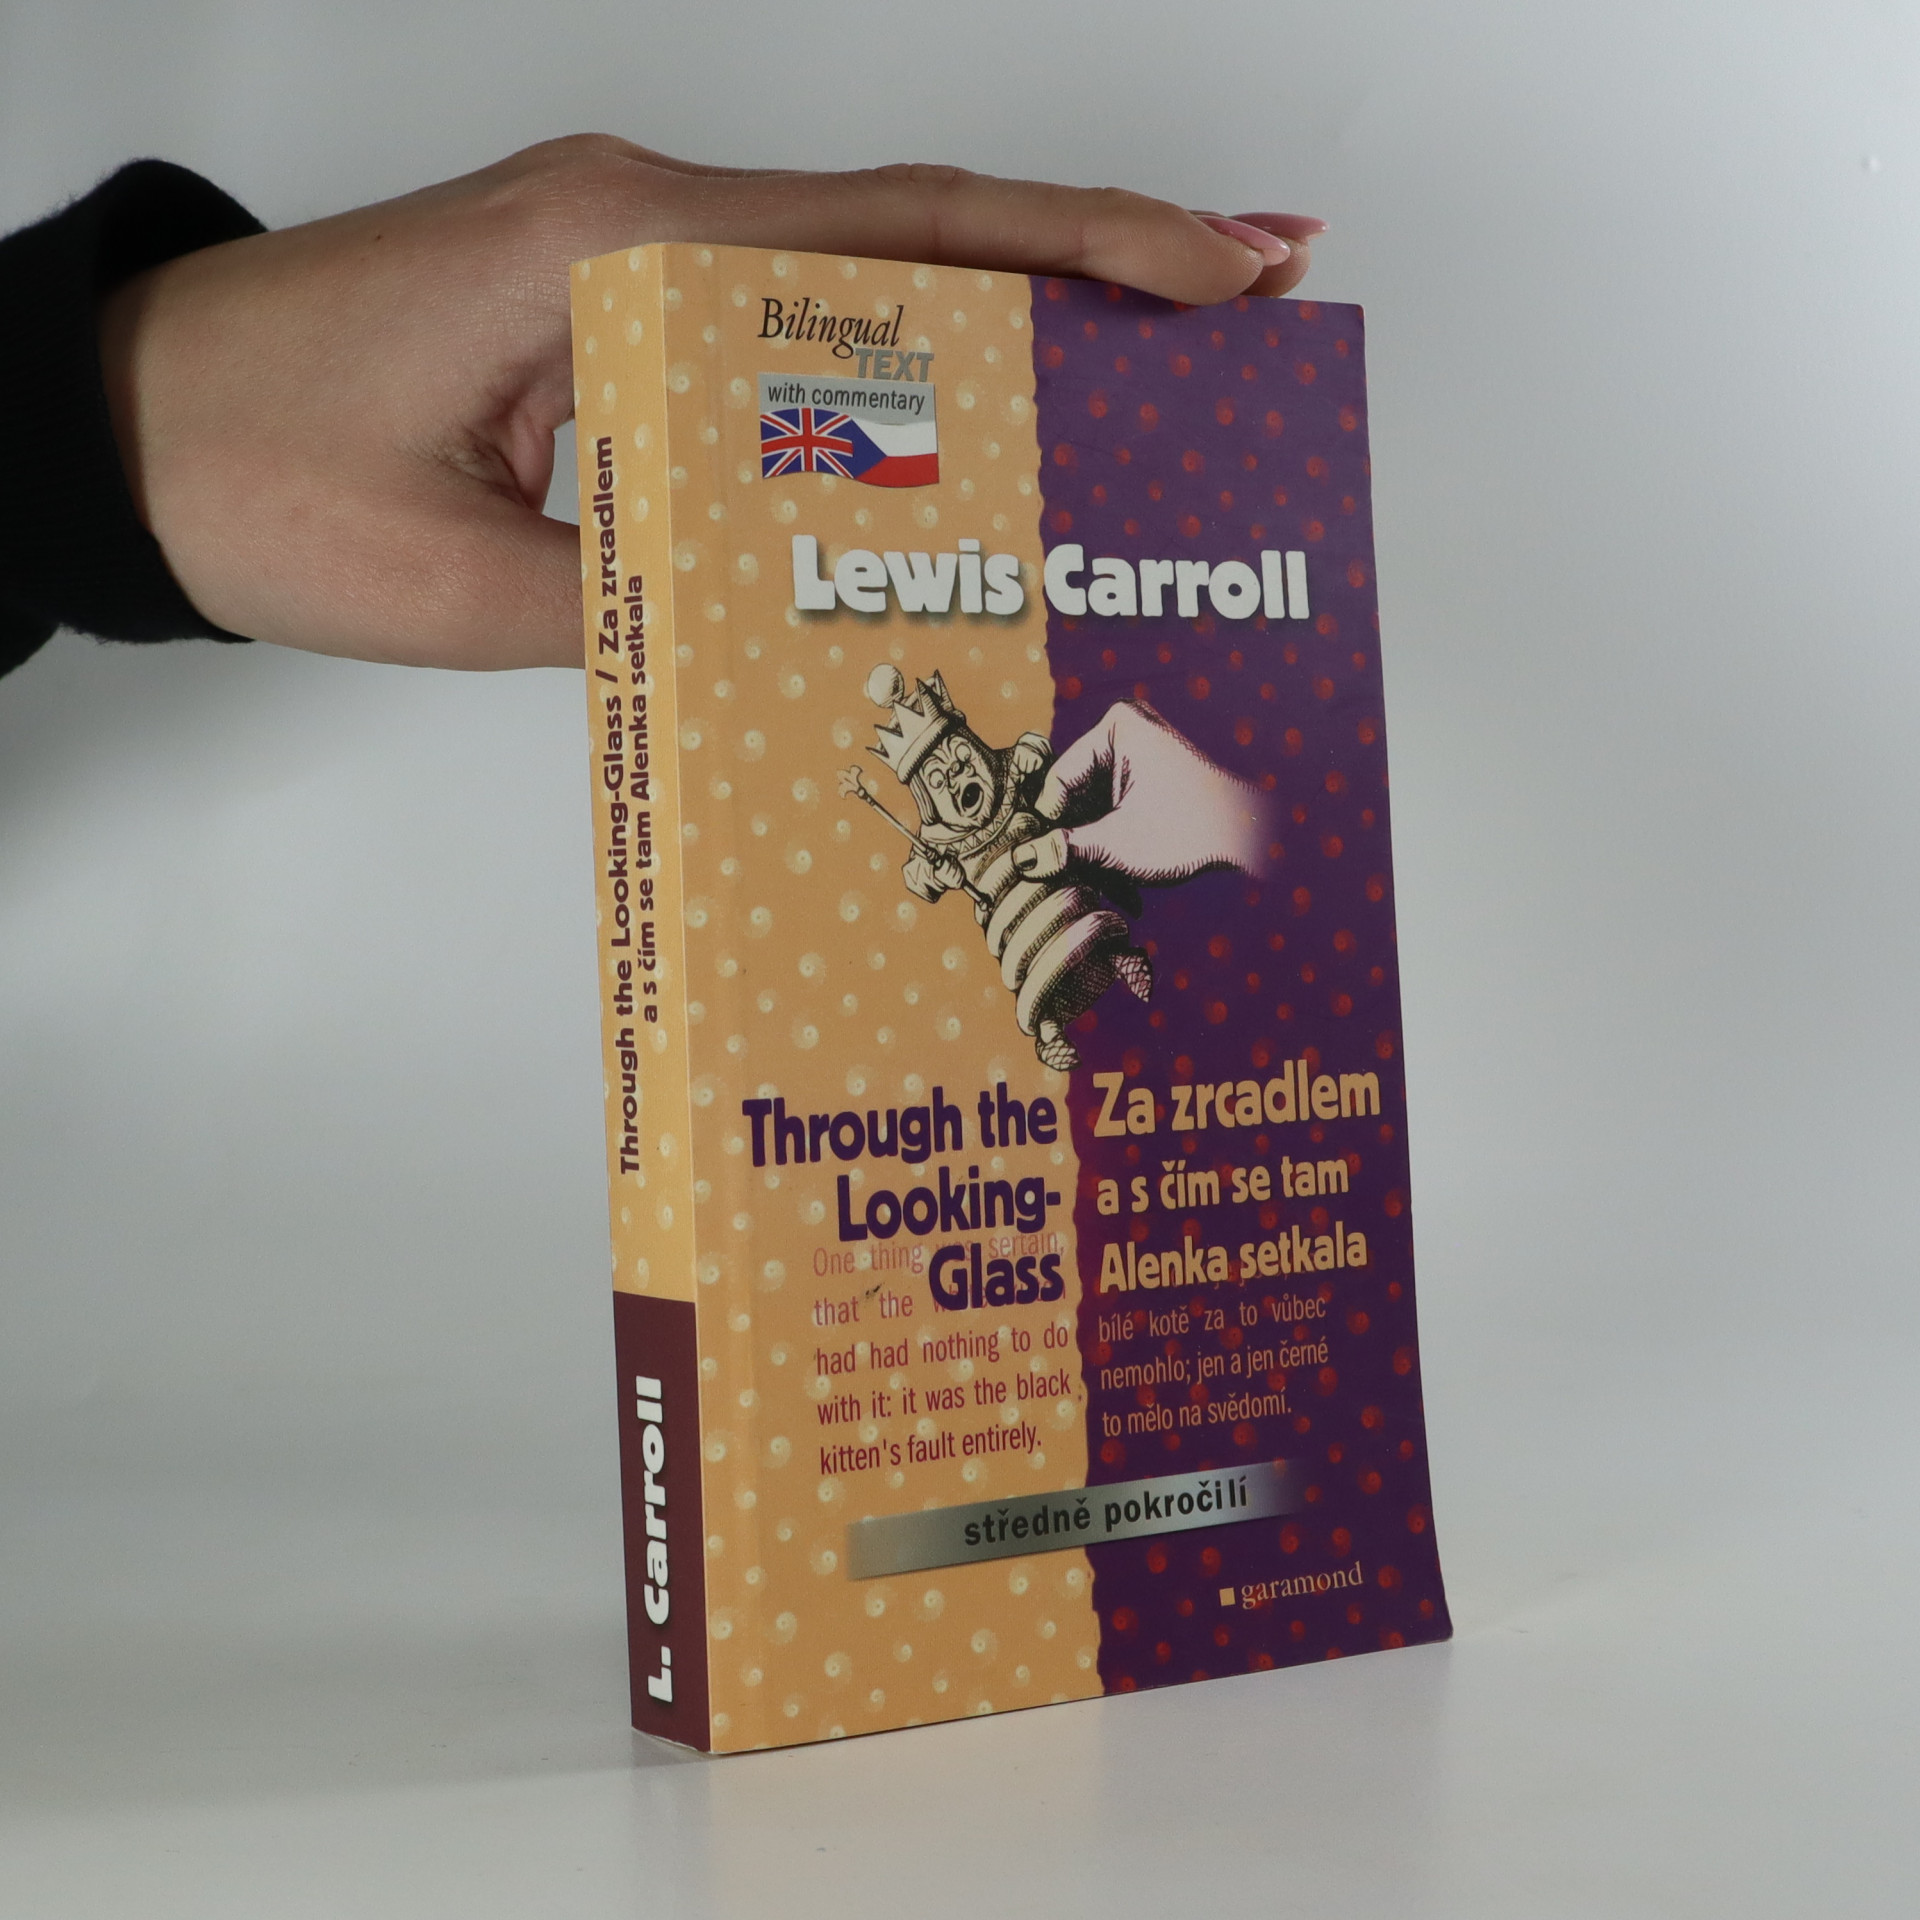 antikvární kniha Through the looking-glass. Za zrcadlem a s čím se tam Alenka setkala, 2004